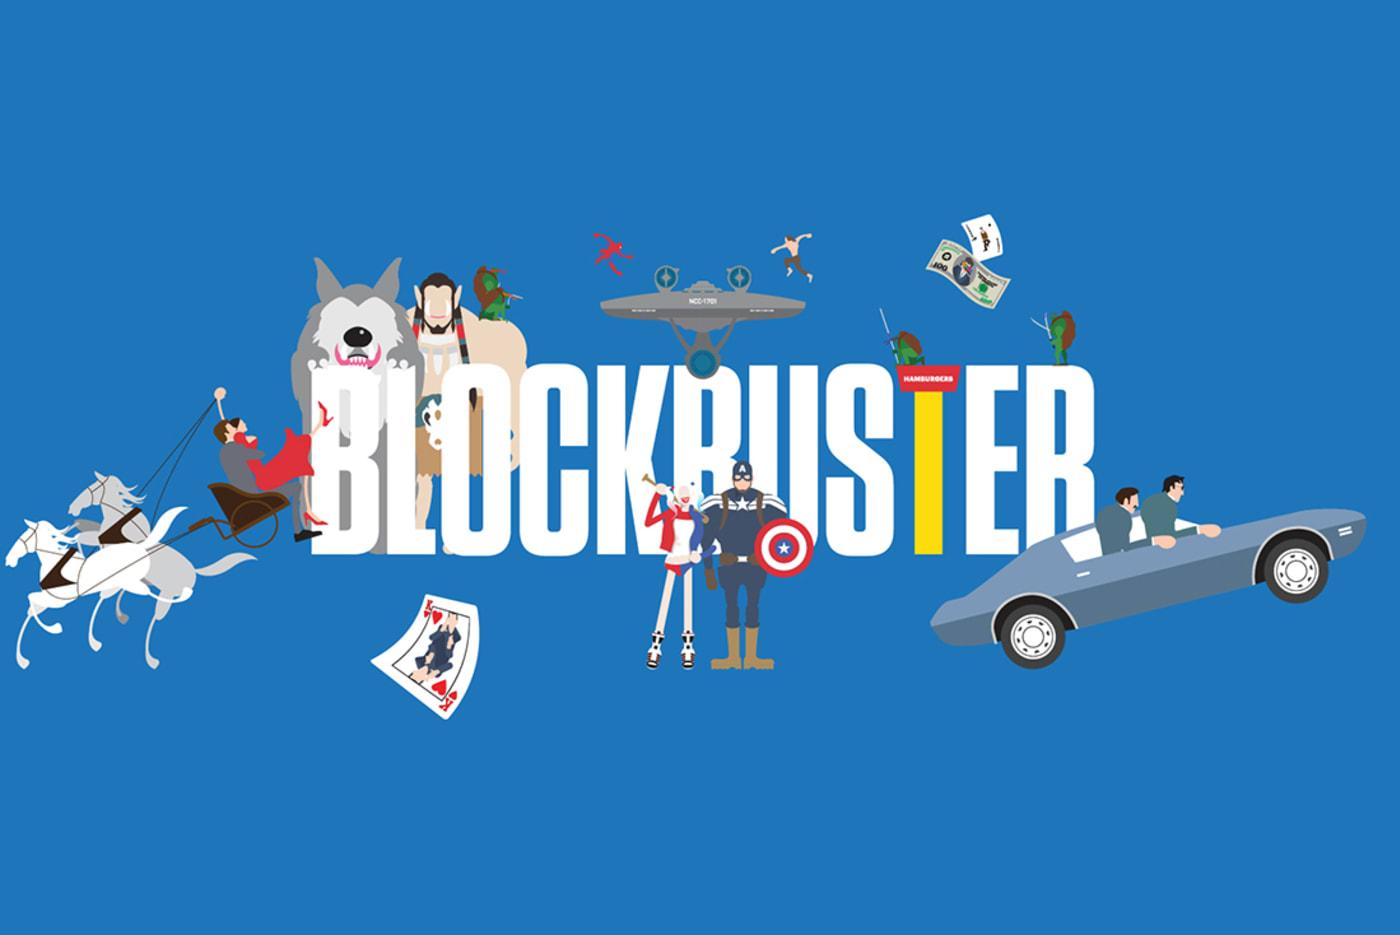 Blockbuster Movies 2016